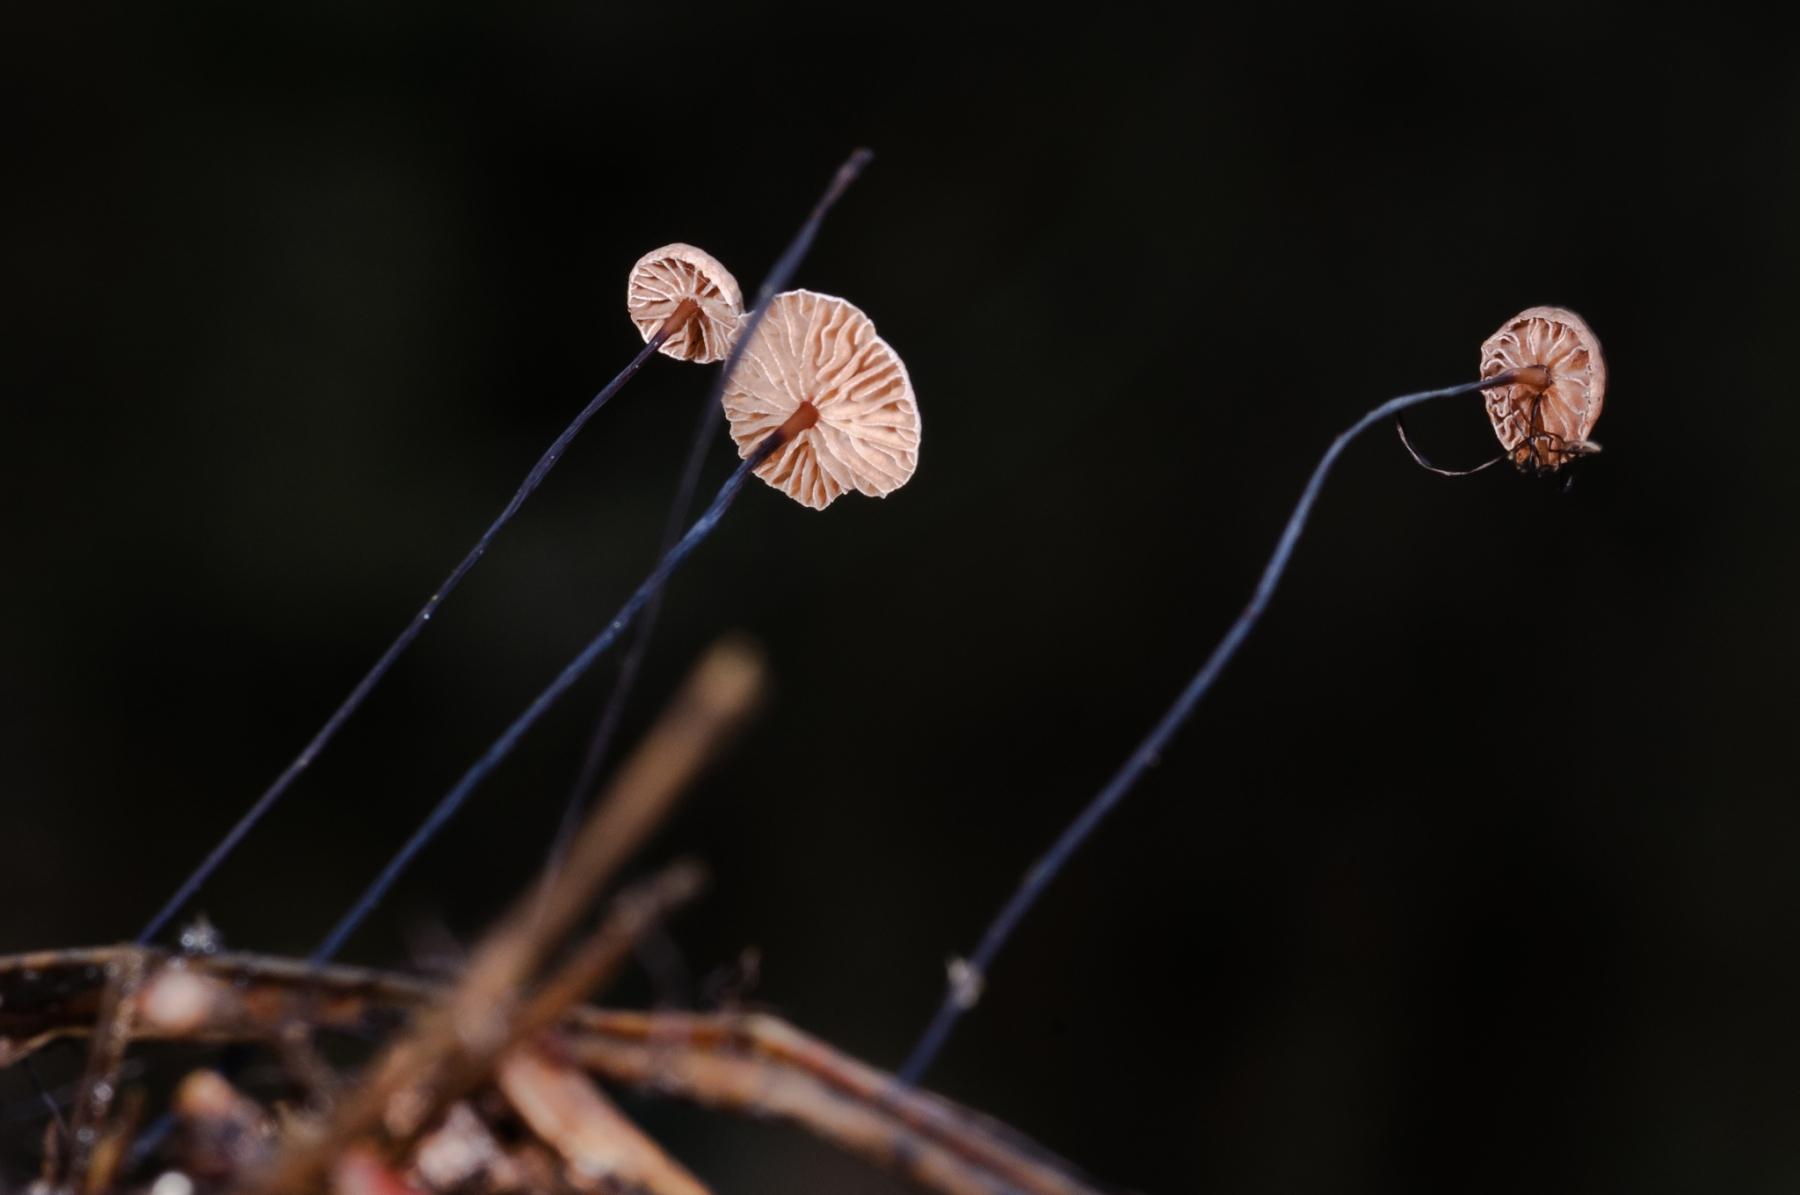 Marasmius androsaceus - Horsehair Parachute, Sherwood Pines, Notts.